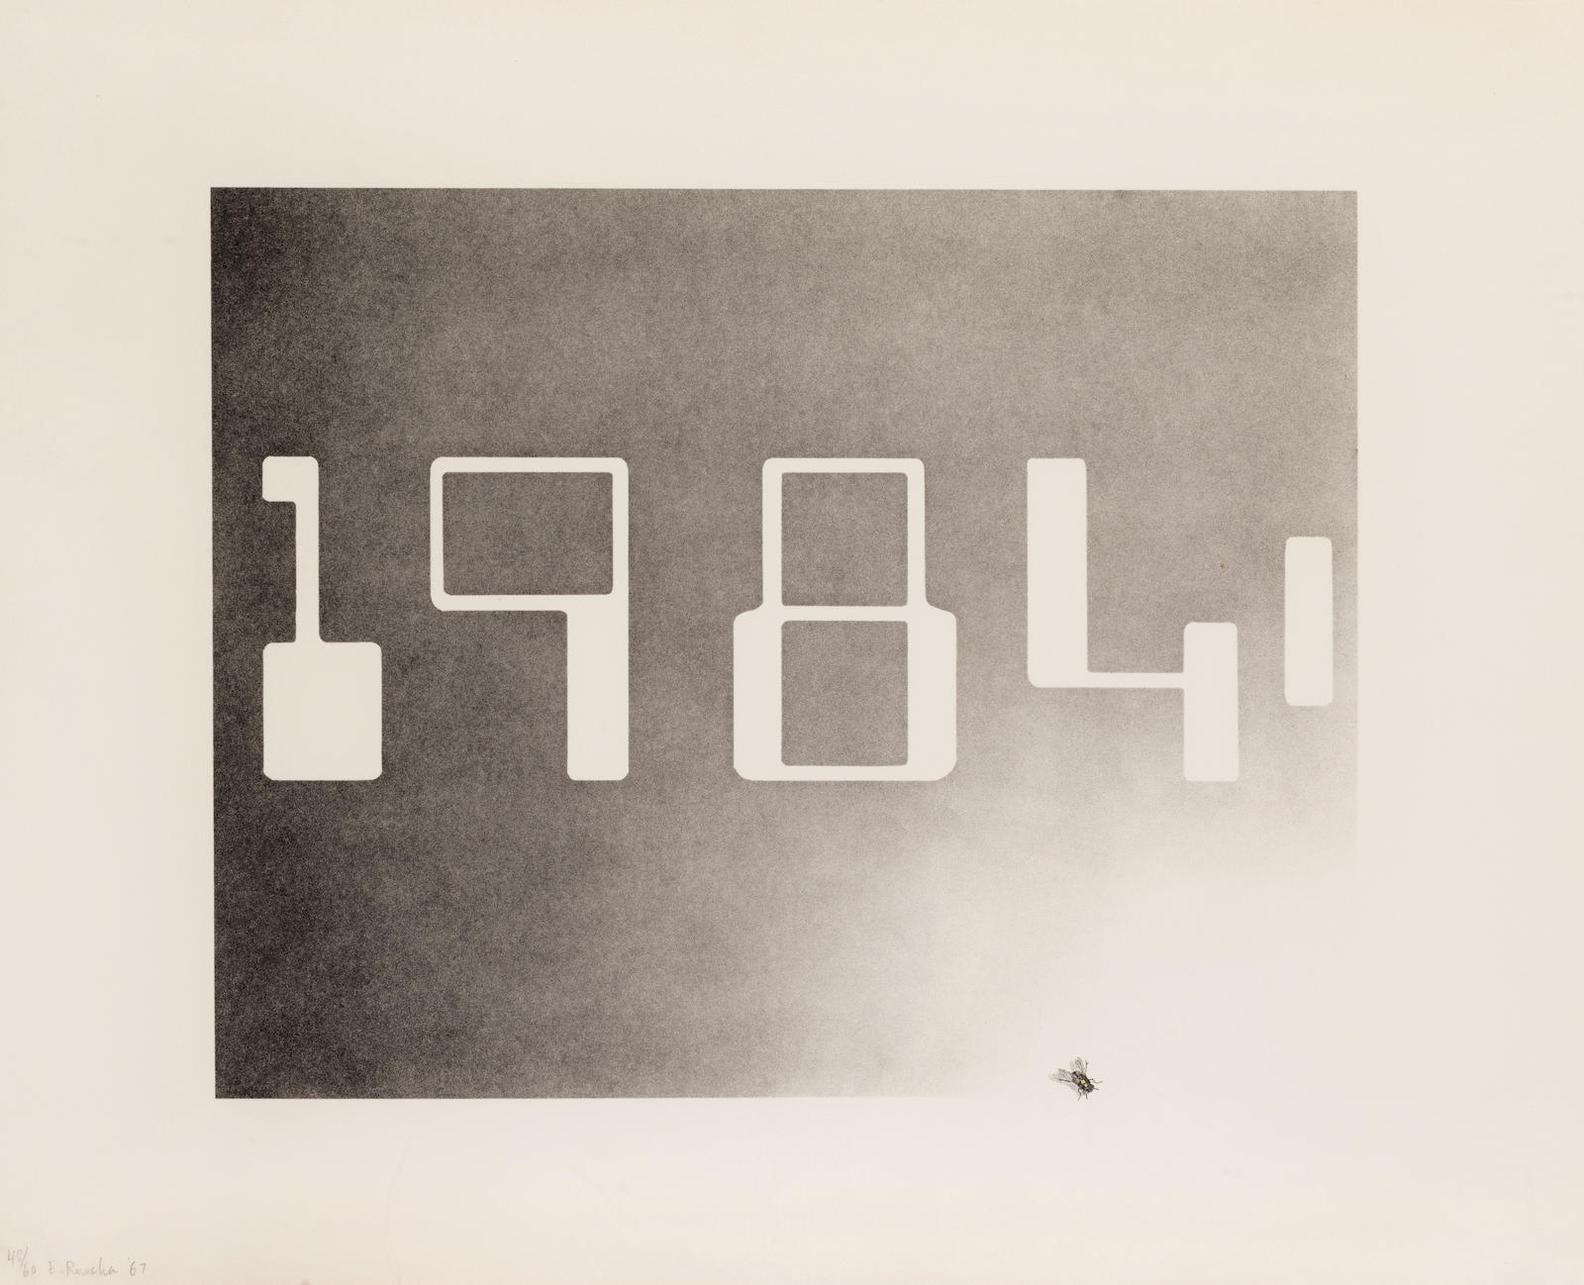 Ed Ruscha-1984 (Walk Art Center 6)-1967